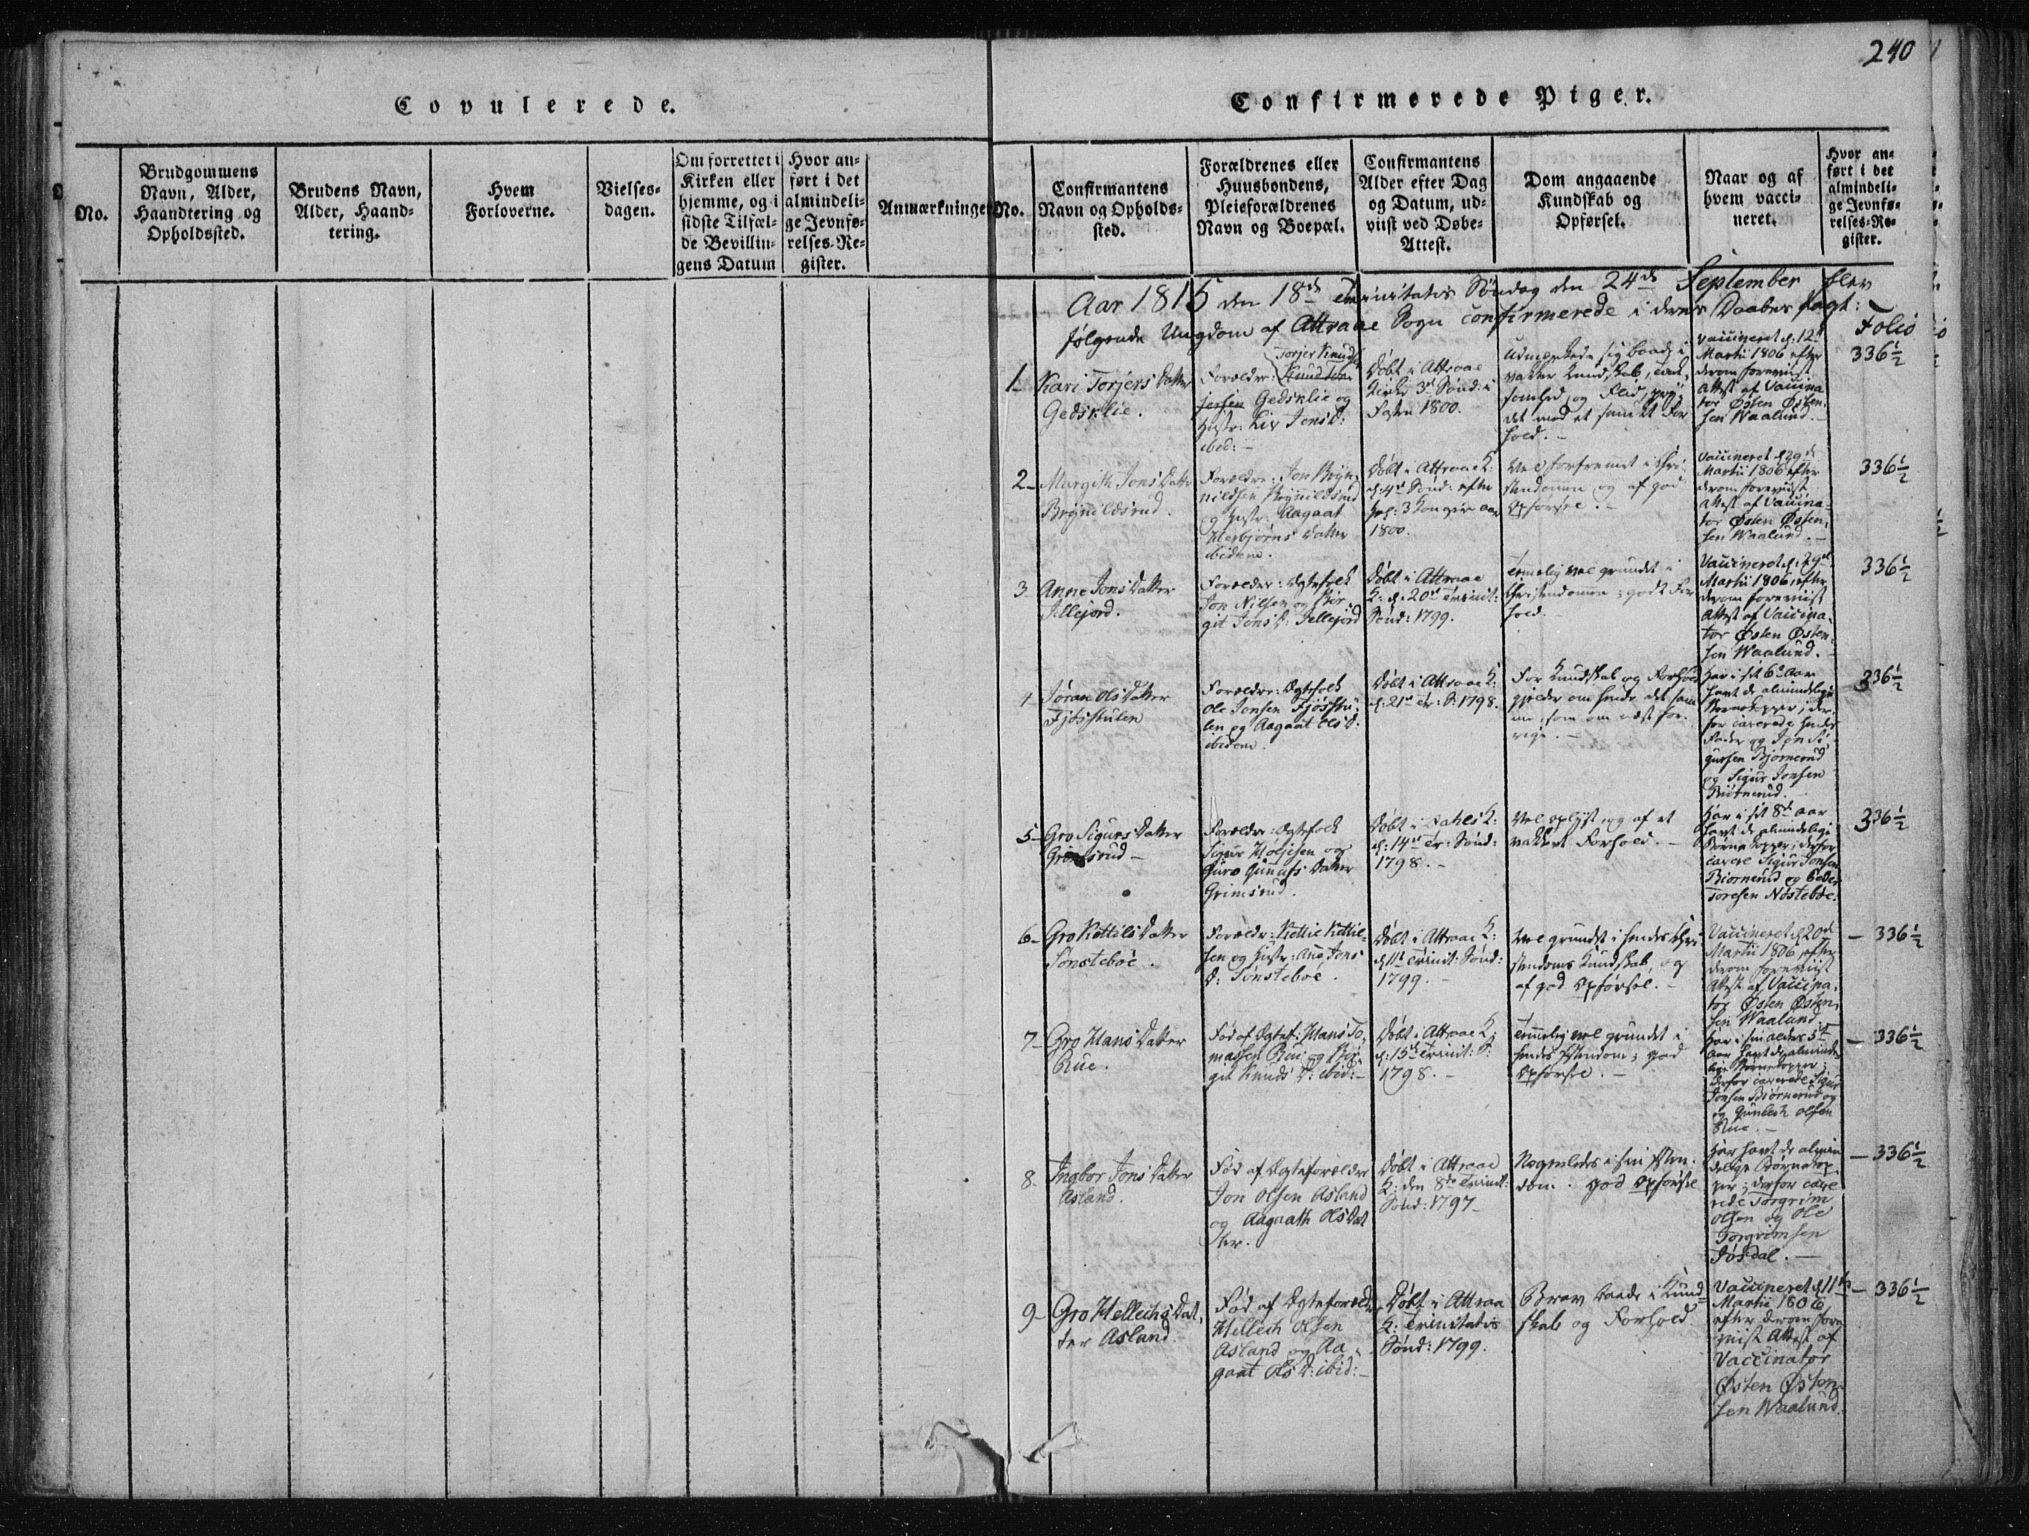 SAKO, Tinn kirkebøker, F/Fa/L0004: Ministerialbok nr. I 4, 1815-1843, s. 240